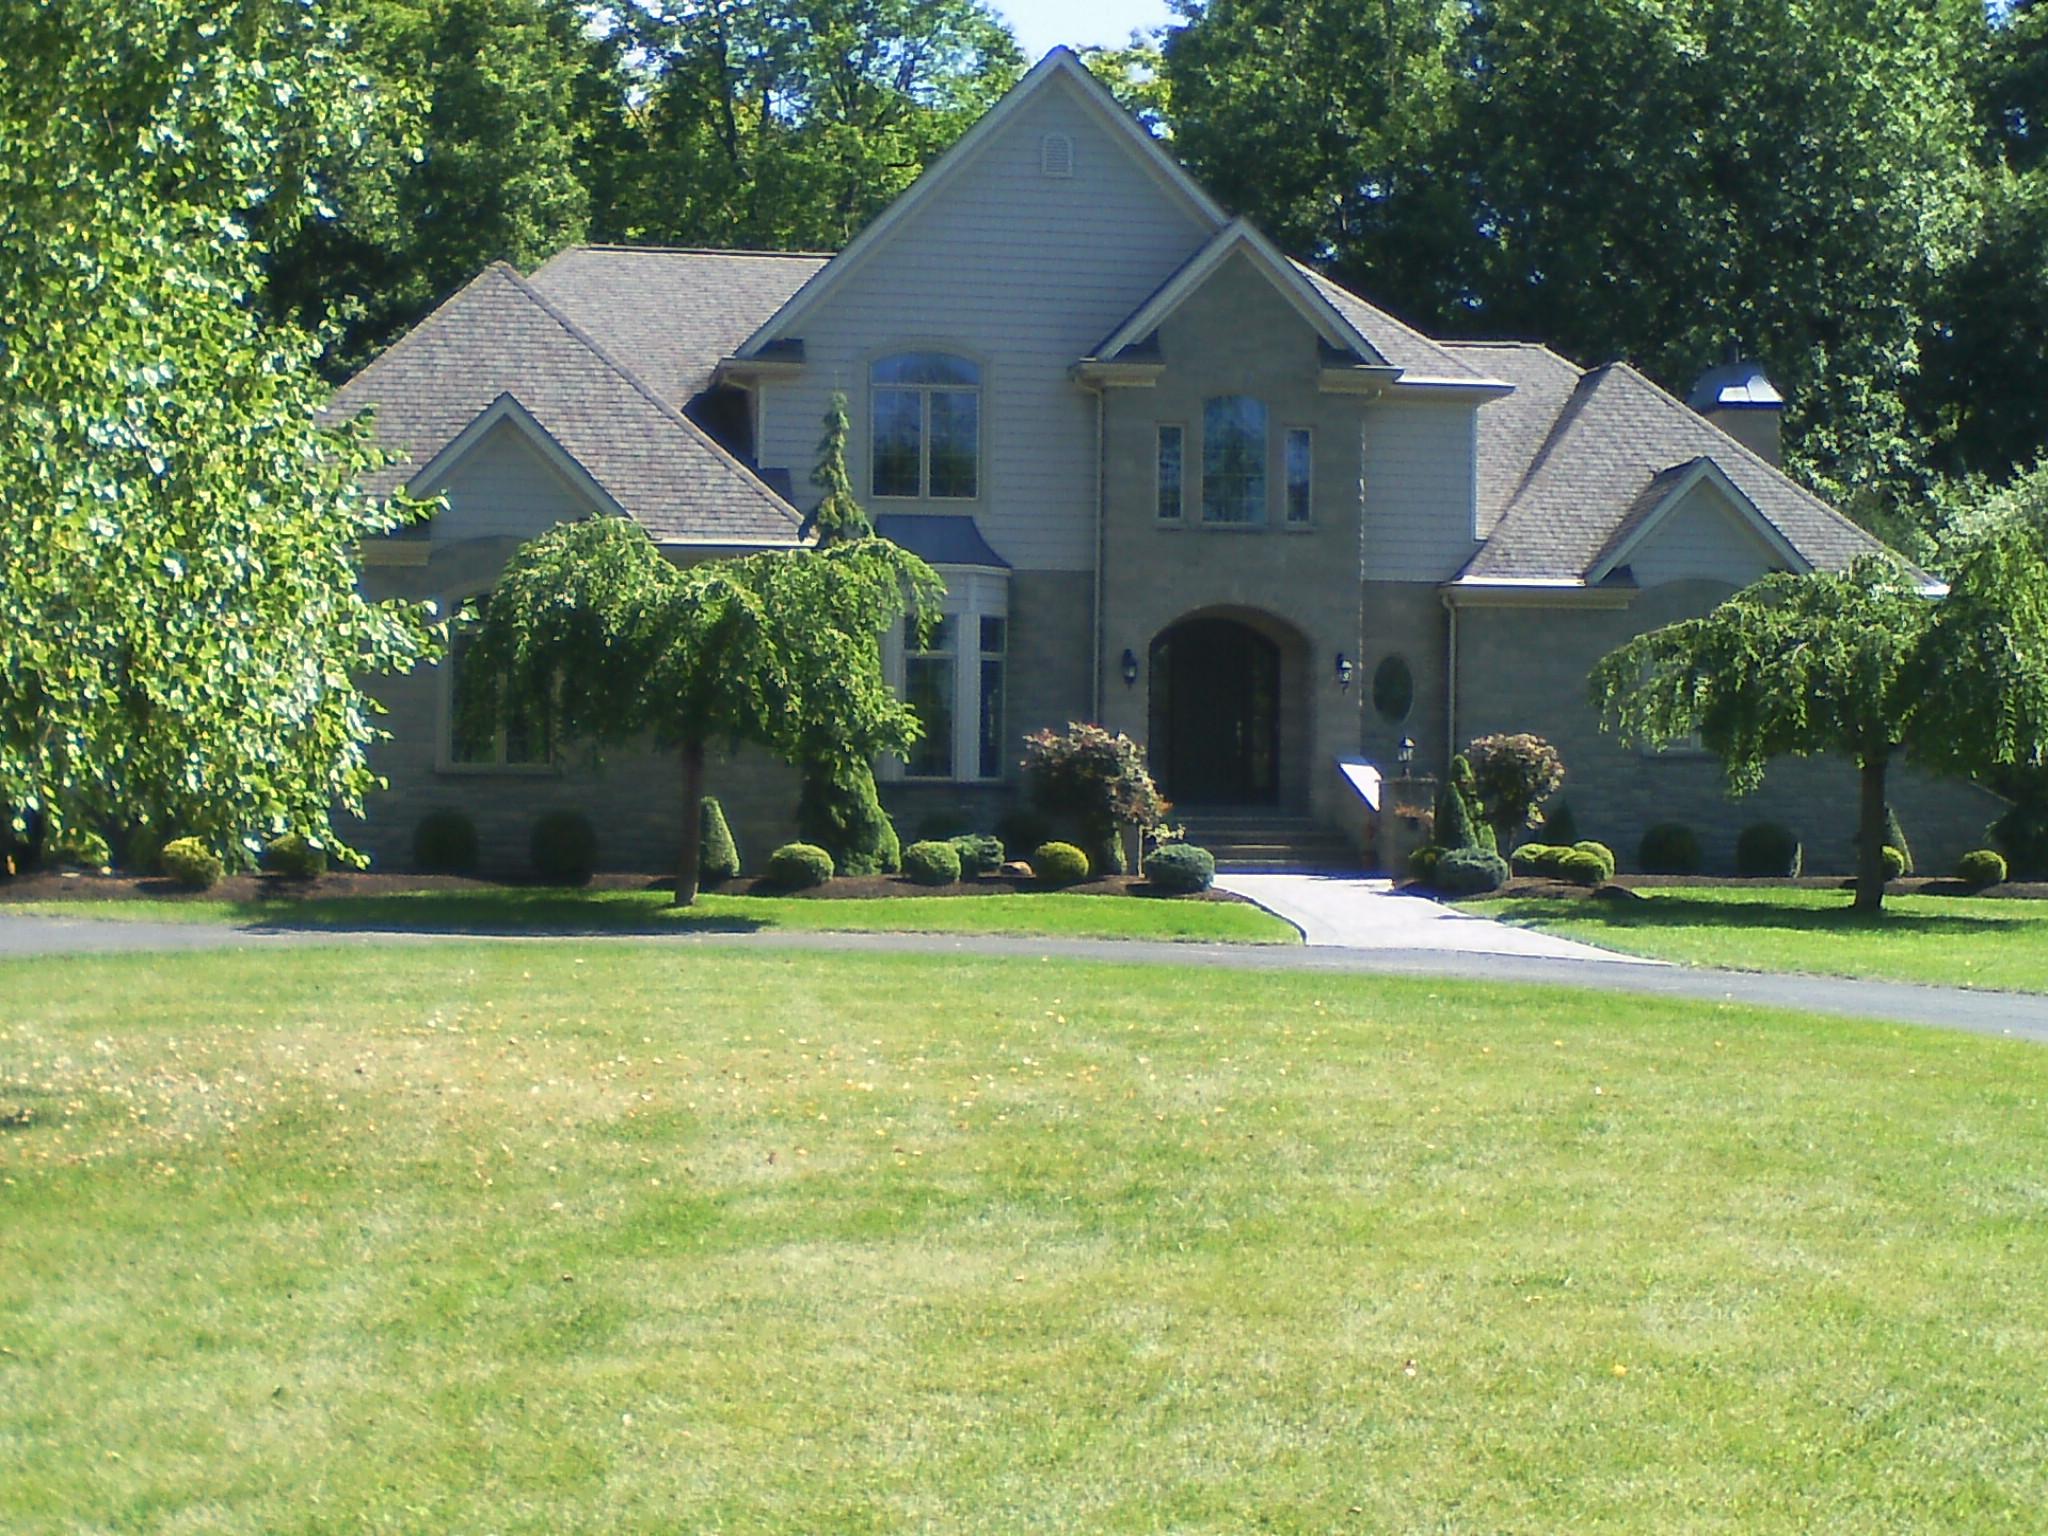 411 Willardshire Road, Elma, New York 14059